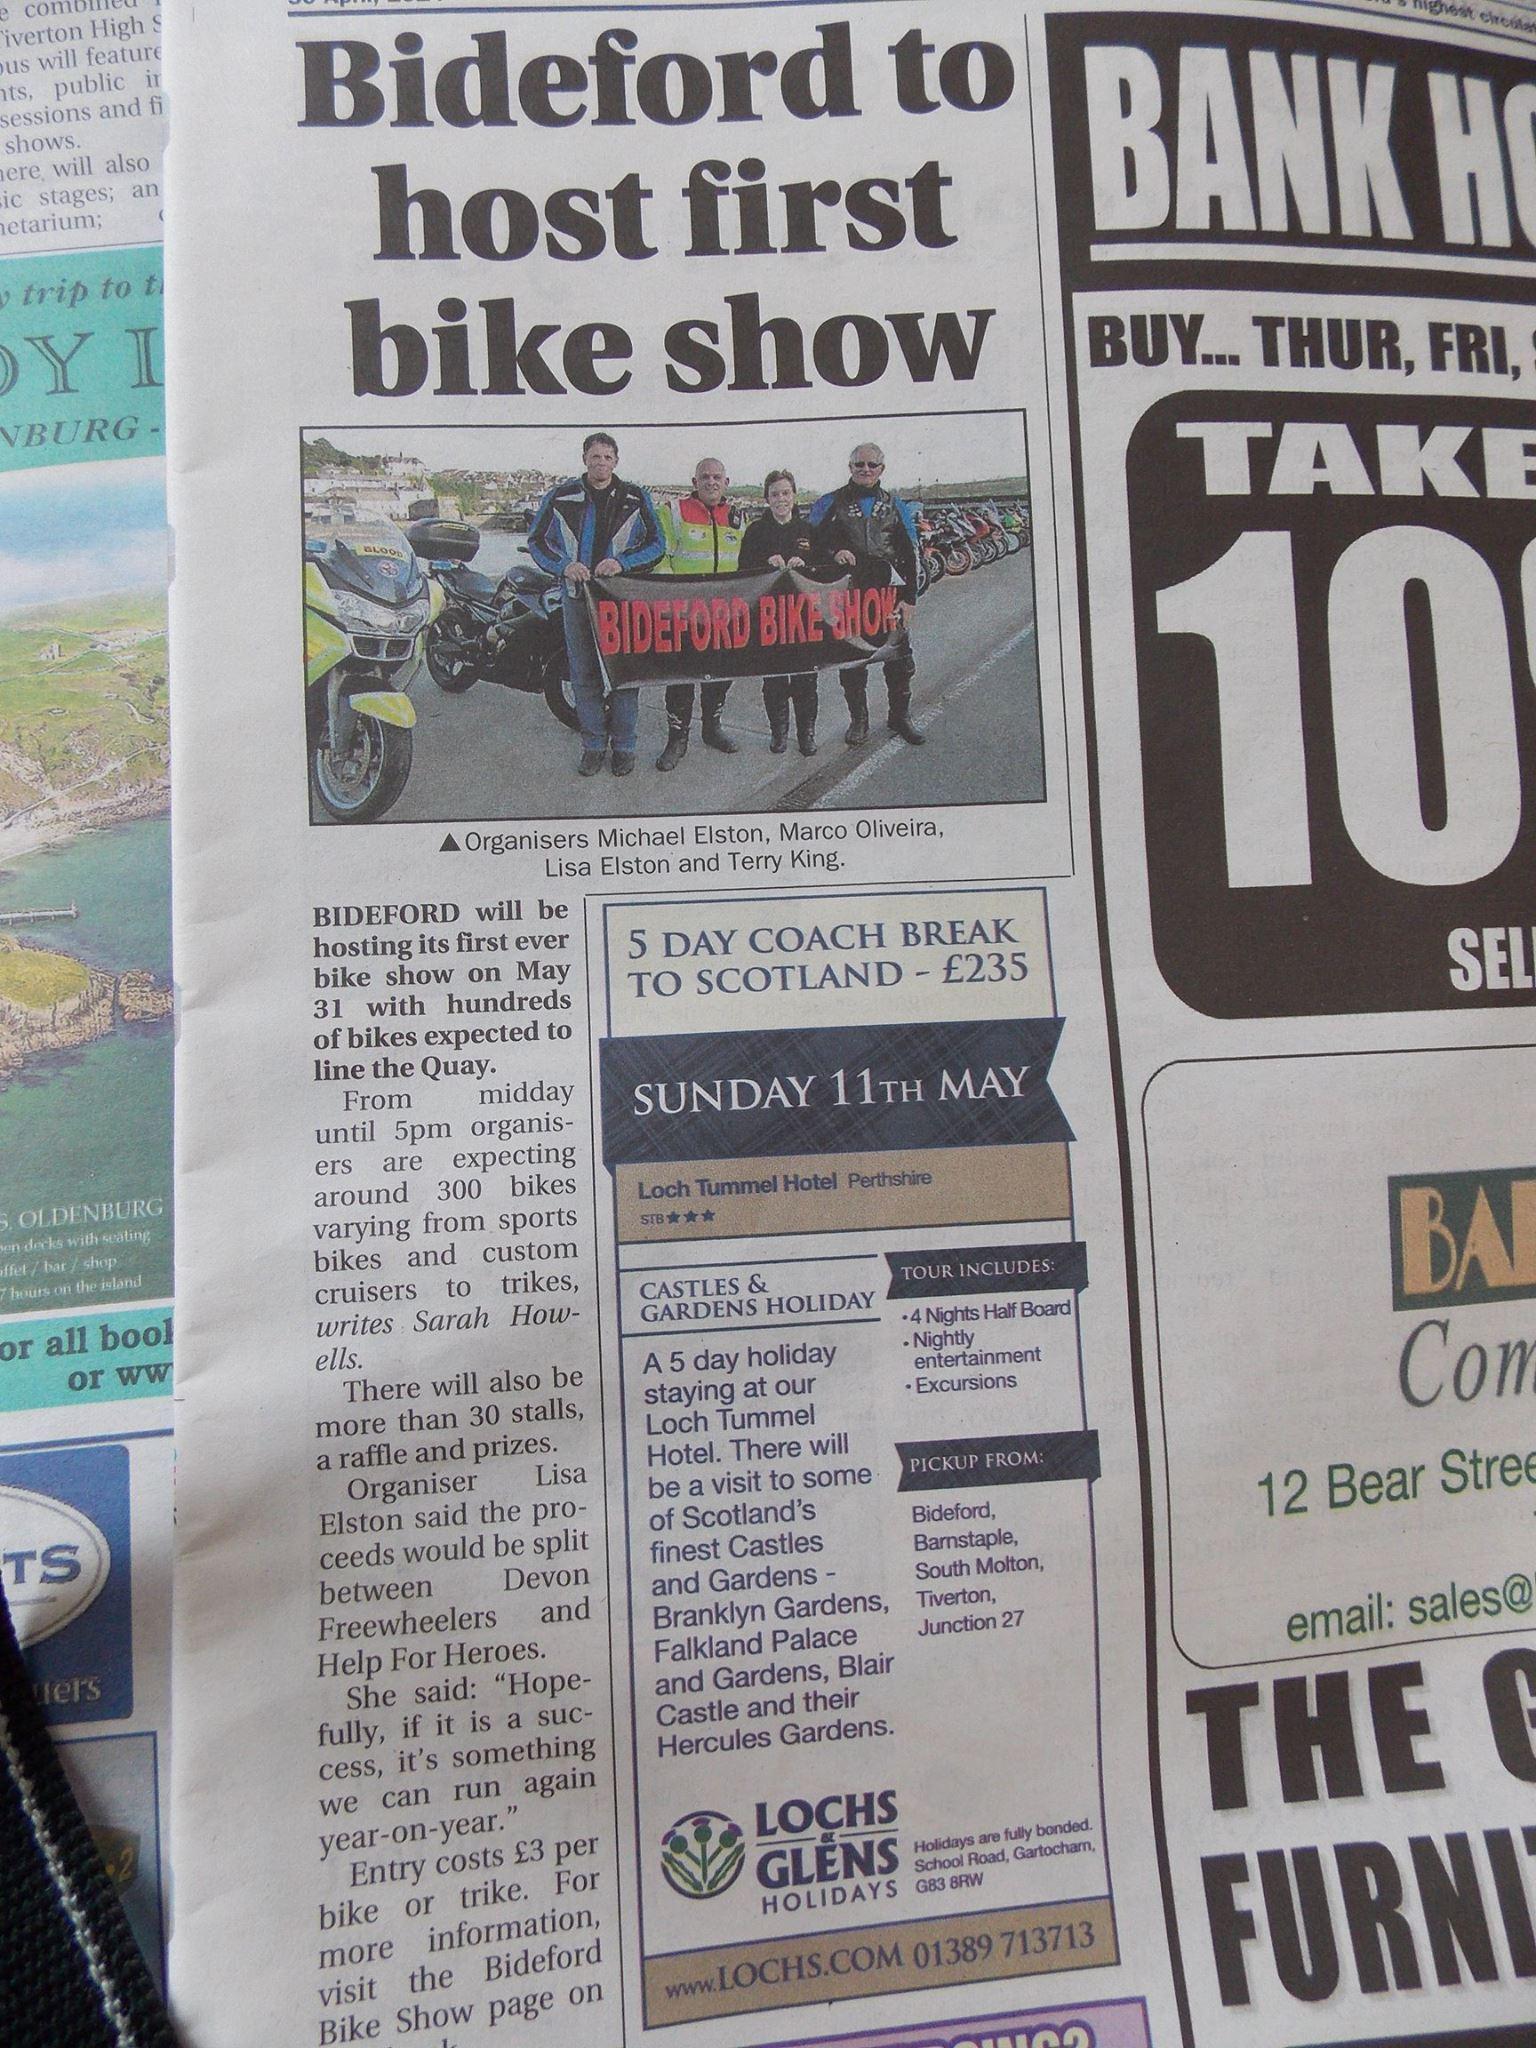 bideford bike show gazette promo article